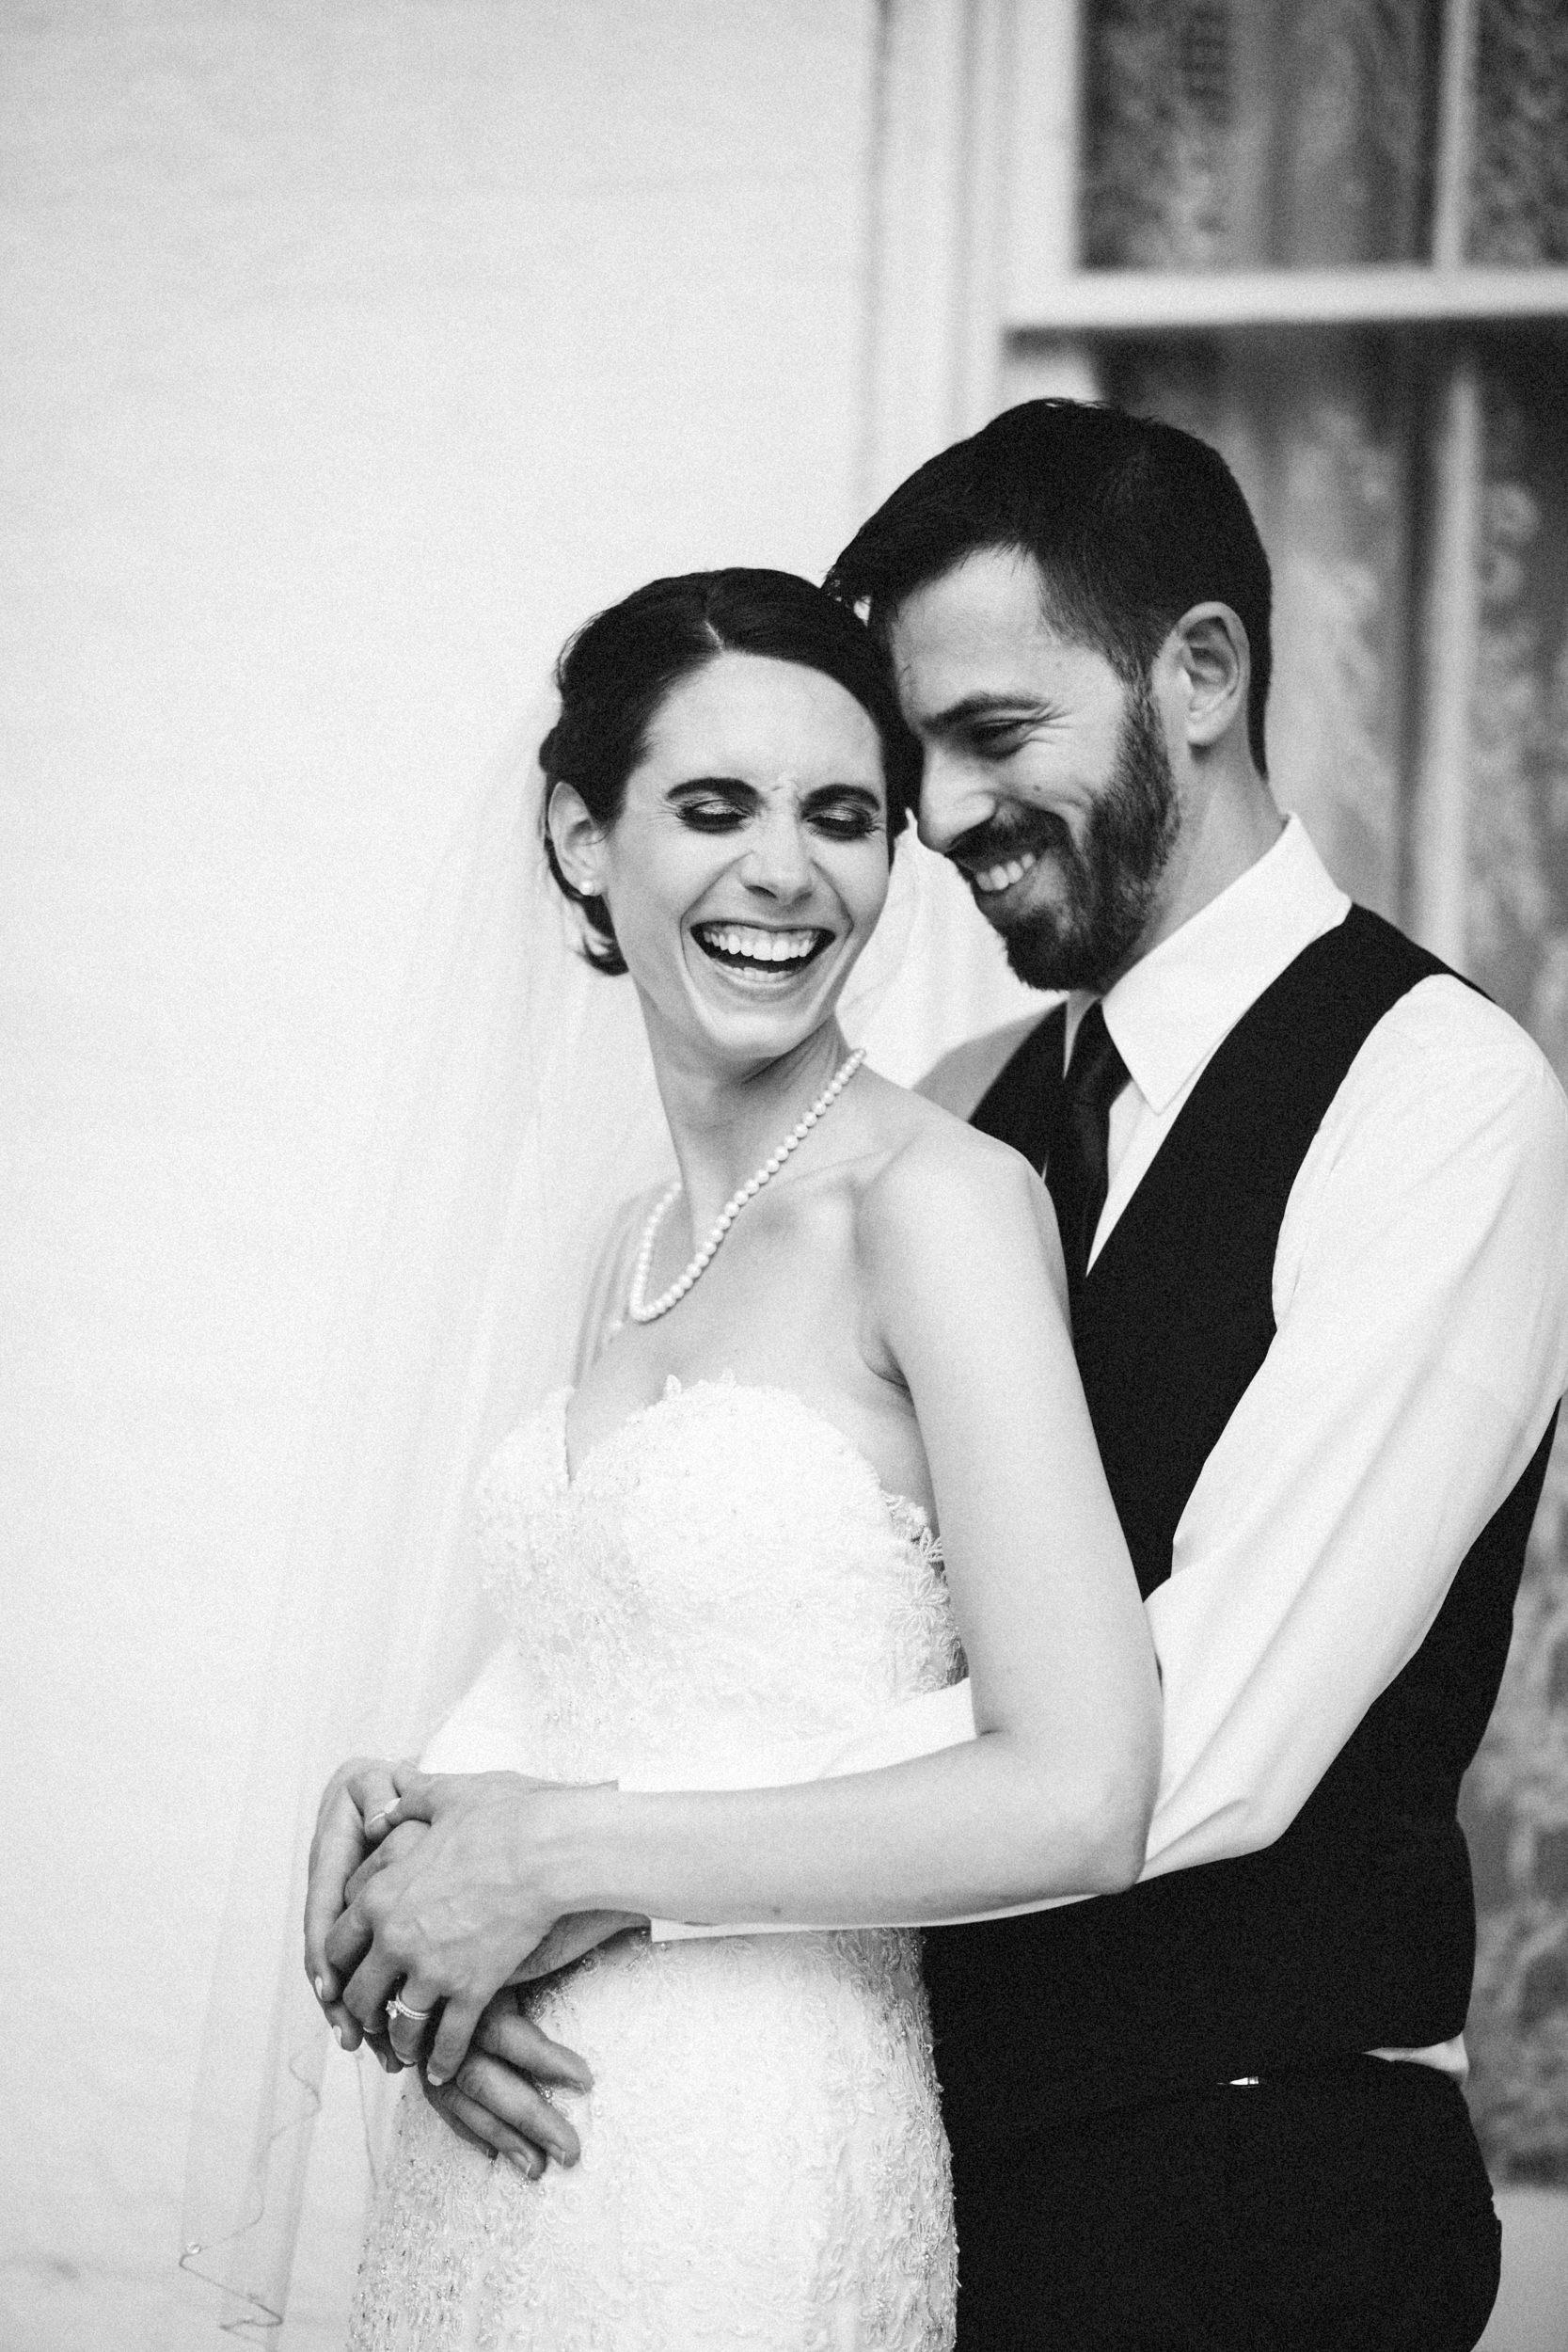 Louisville-Kentucky-Wedding-Elopement-Photographer-Sarah-Katherine-Davis-Photography-Whitehall-Classic-Timeless-Garden-Wedding-584.jpg